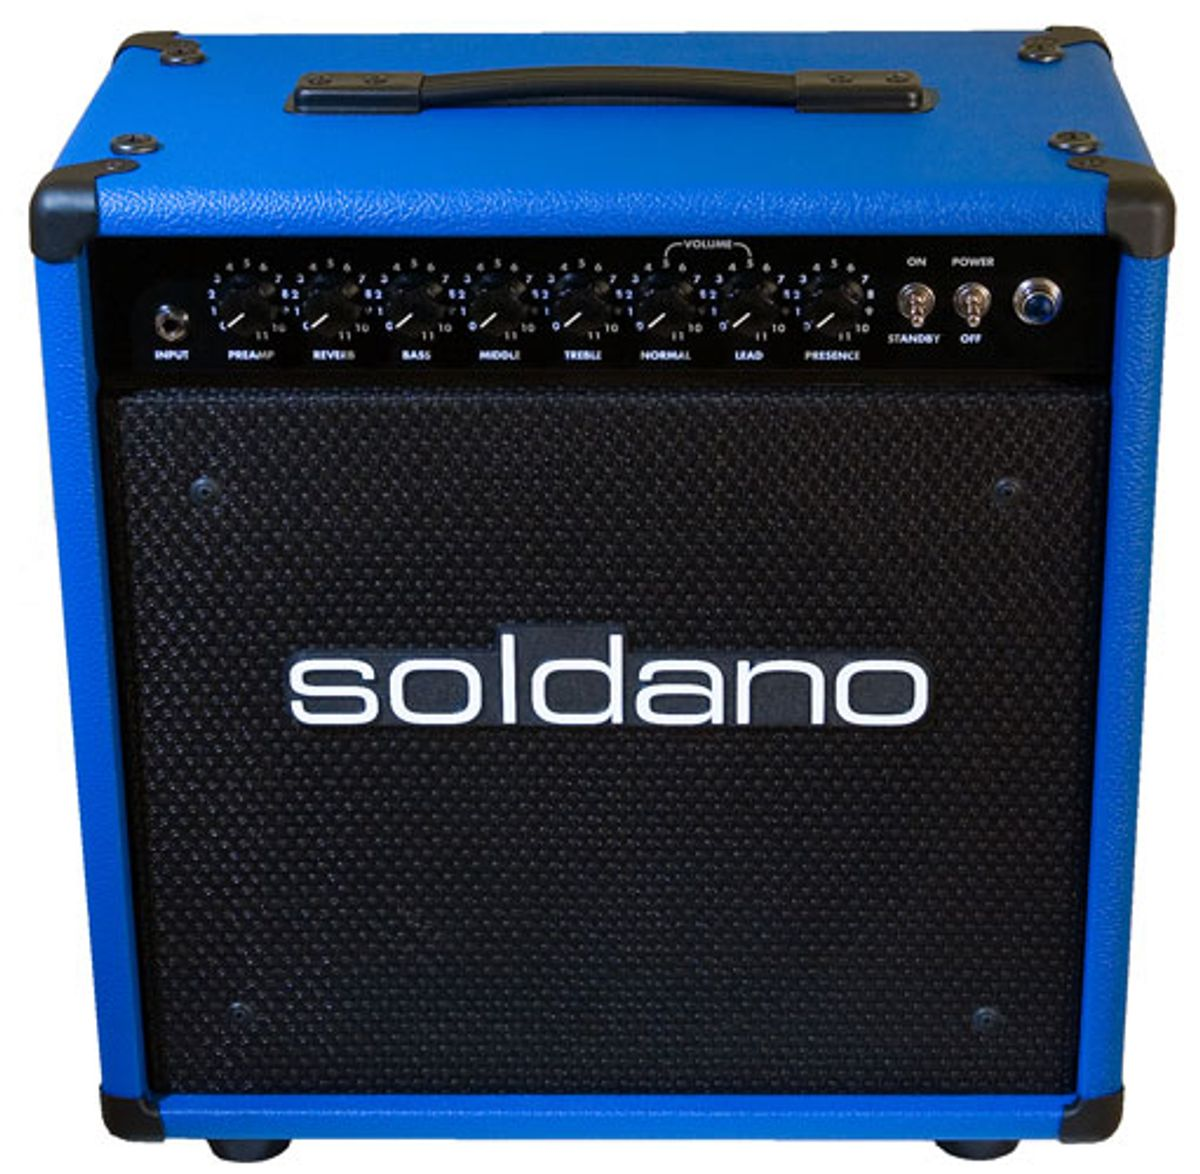 Blues City Music Relaunches 10th Anniversary Soldano 44